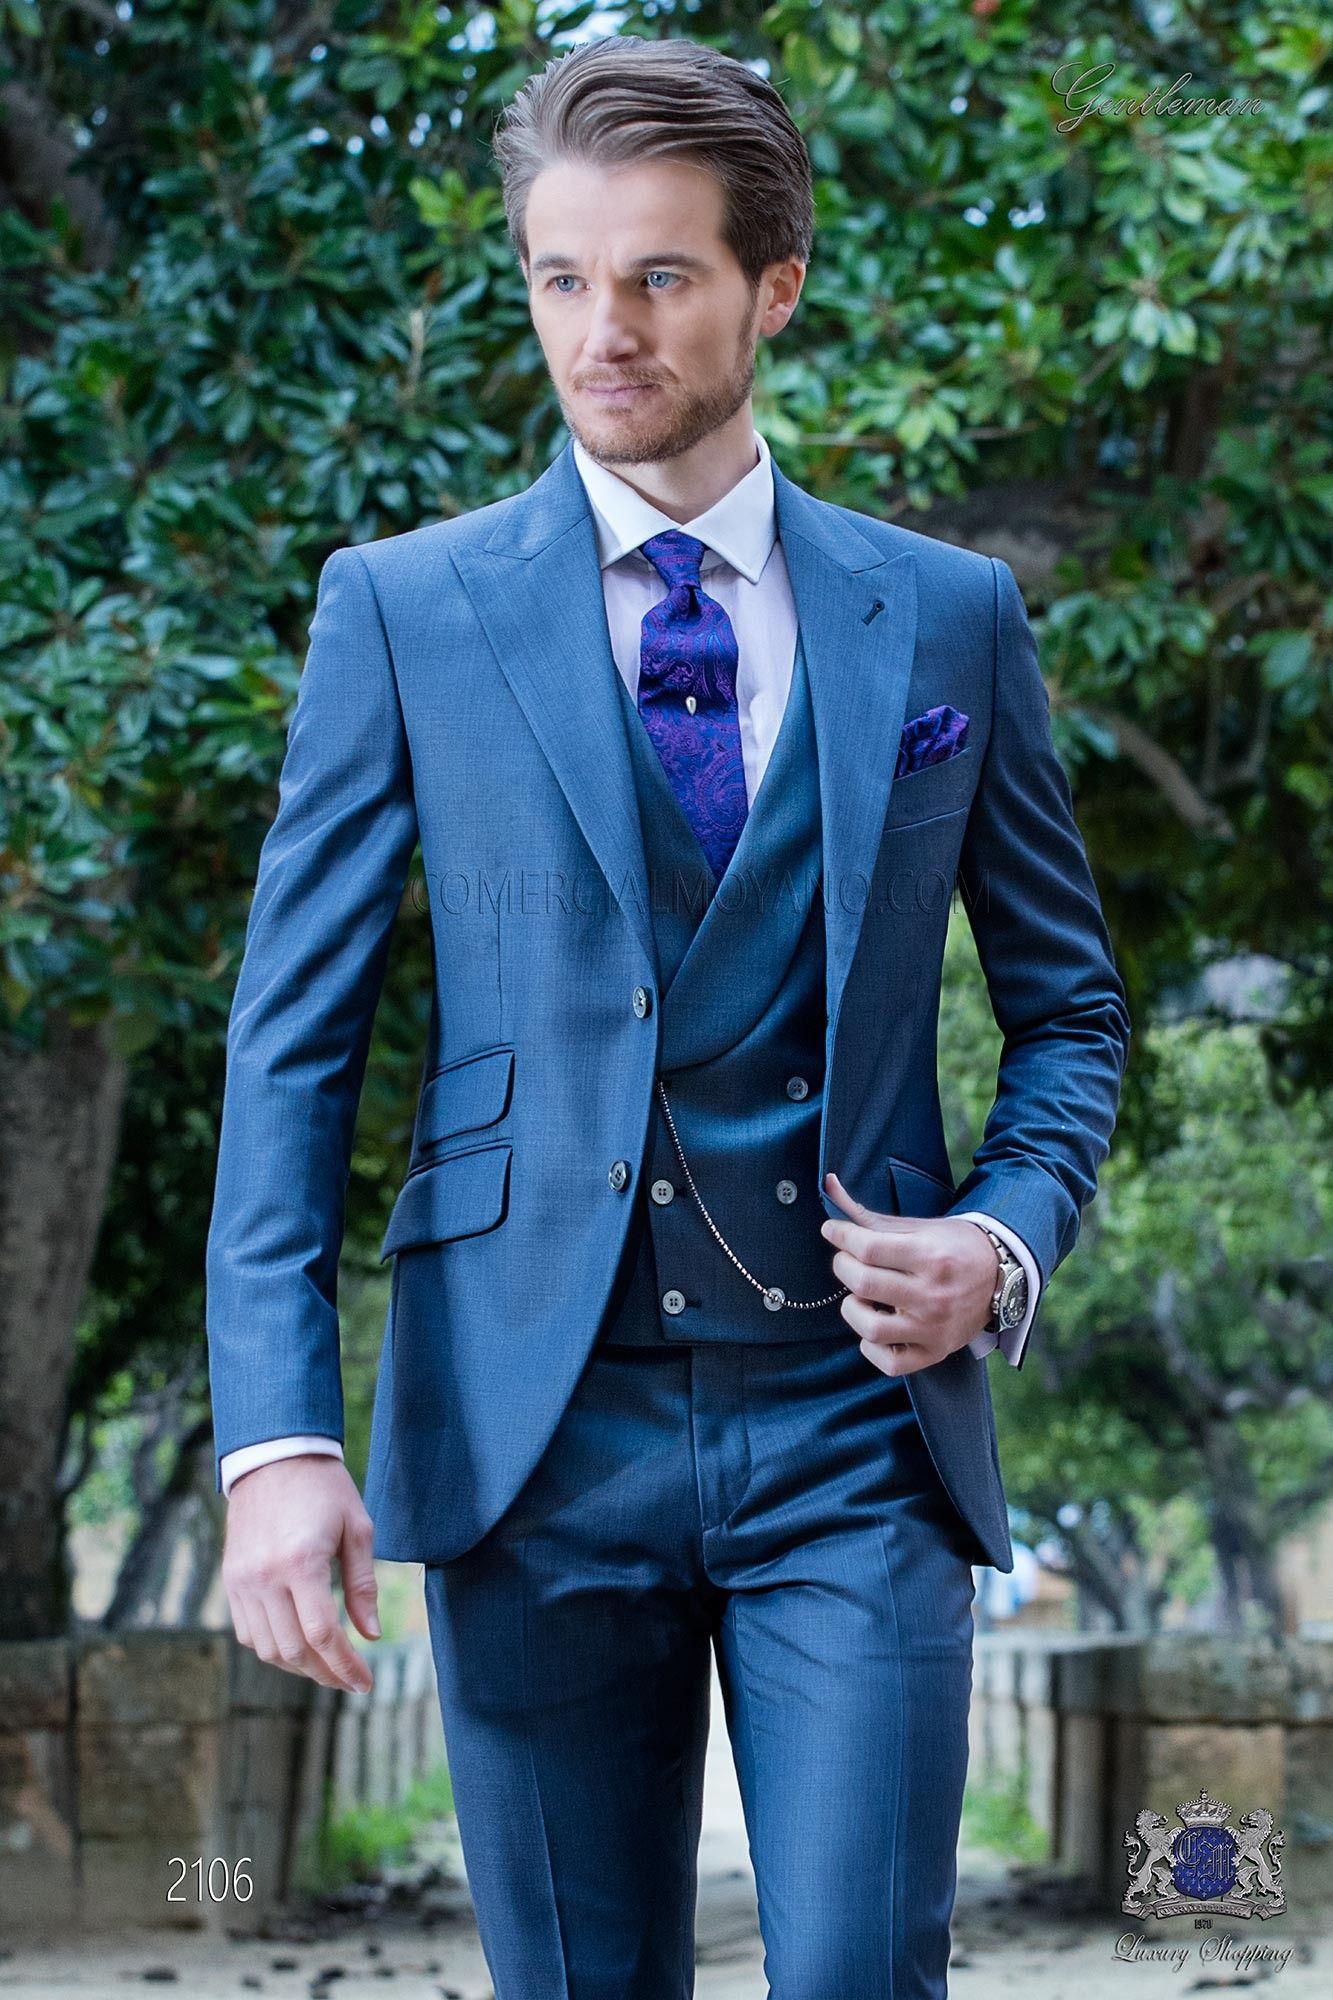 Traje italiano a medida azul fil a fil mixto lana | Gentlemen wear ...